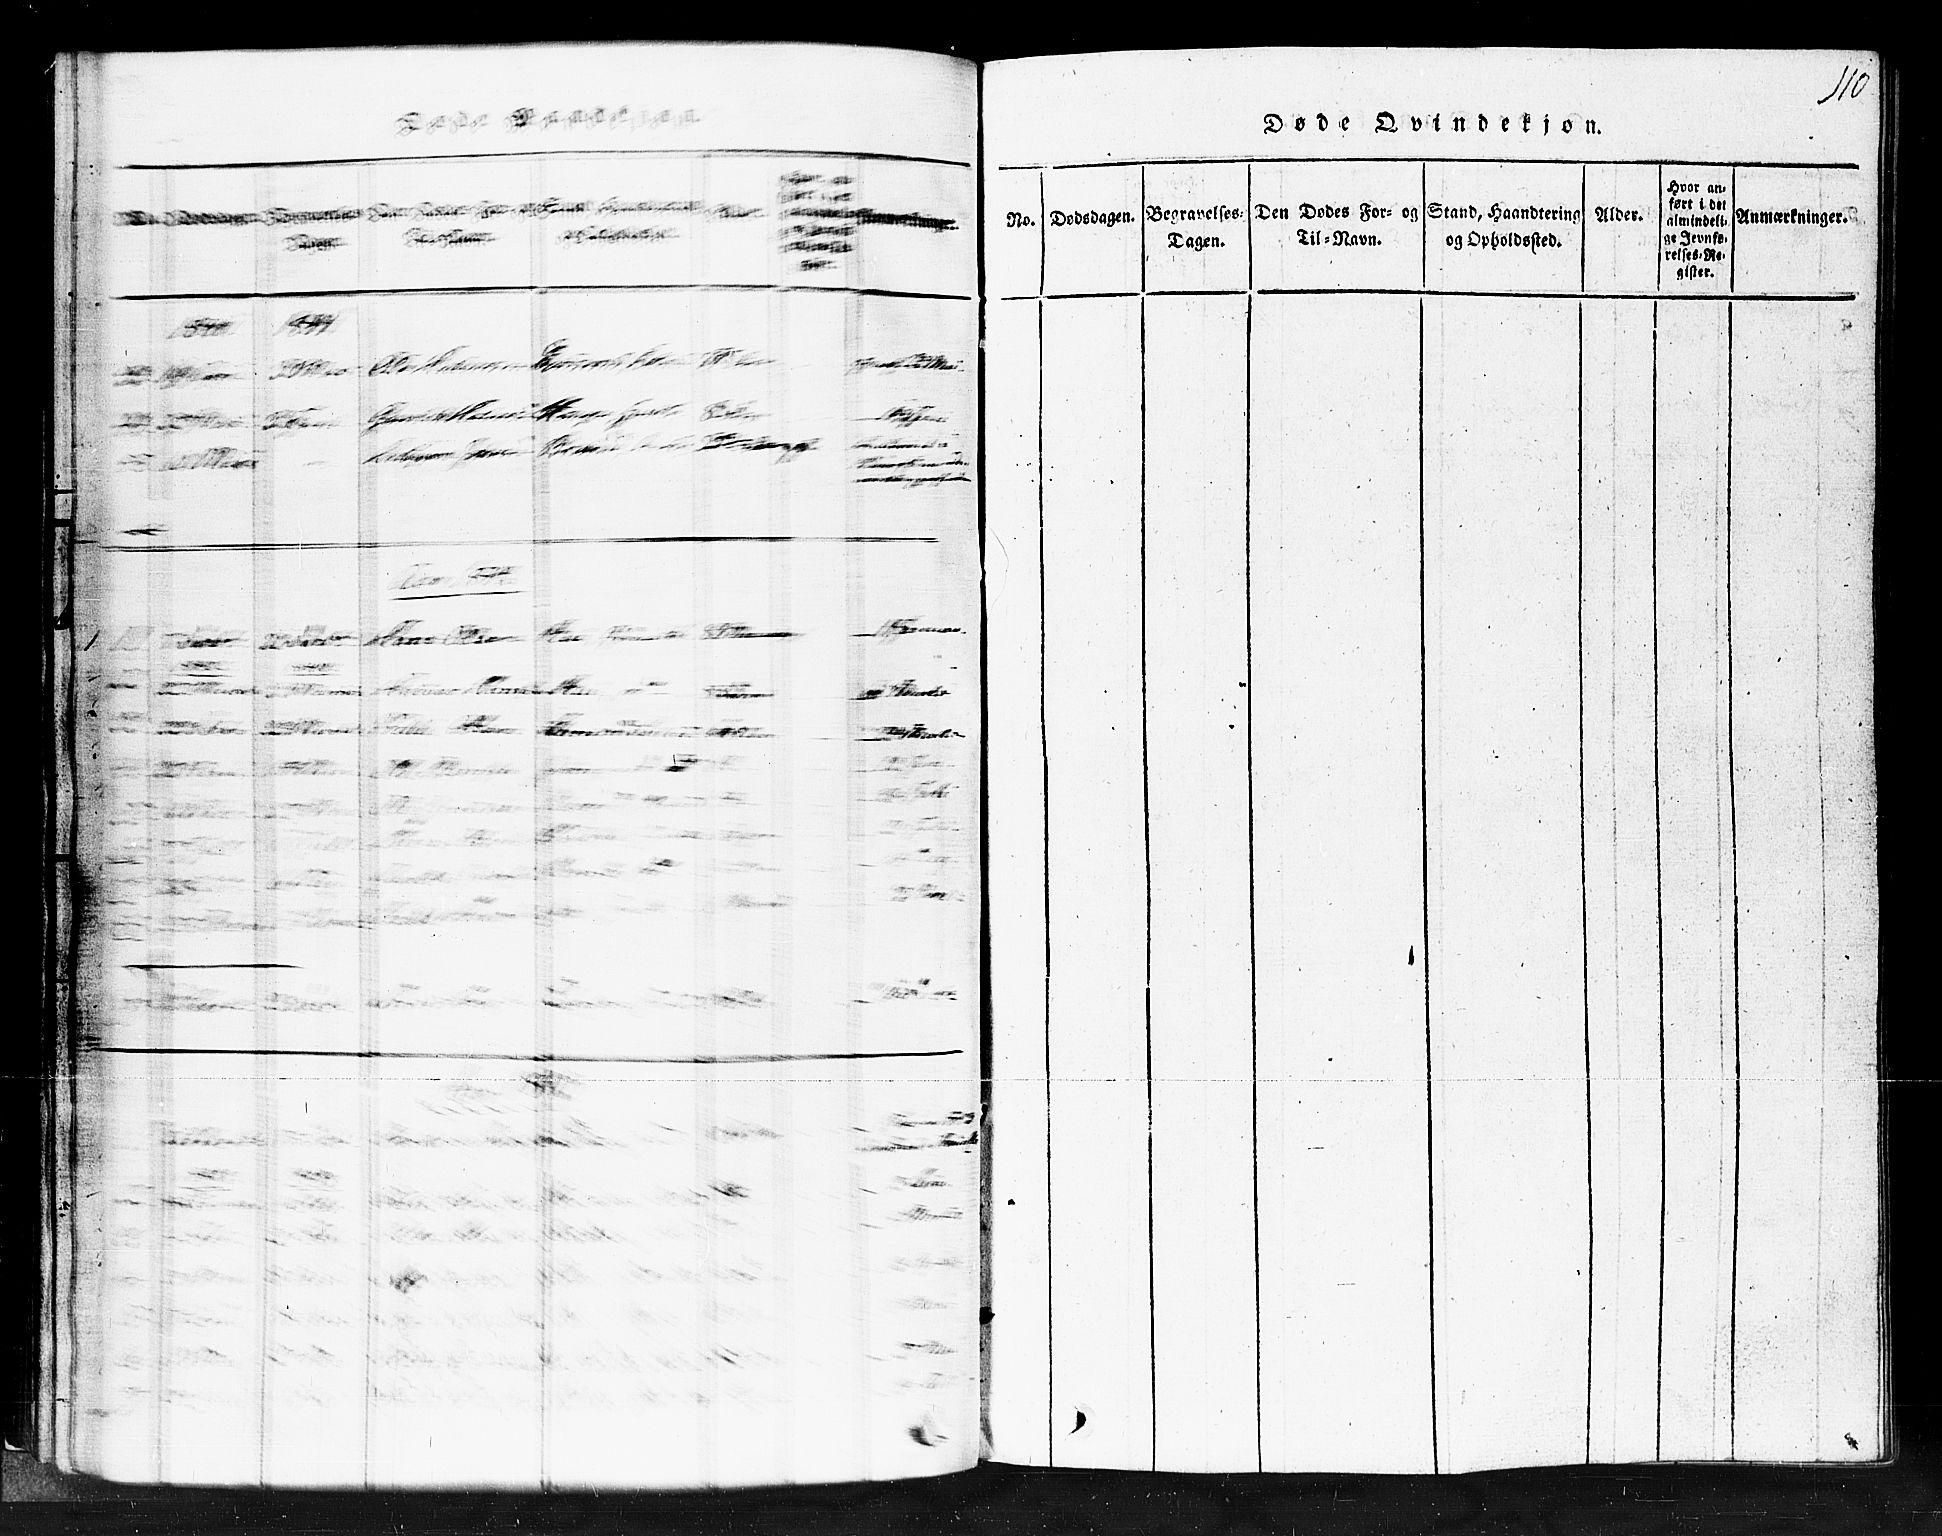 SAKO, Gransherad kirkebøker, F/Fb/L0002: Ministerialbok nr. II 2, 1815-1843, s. 110